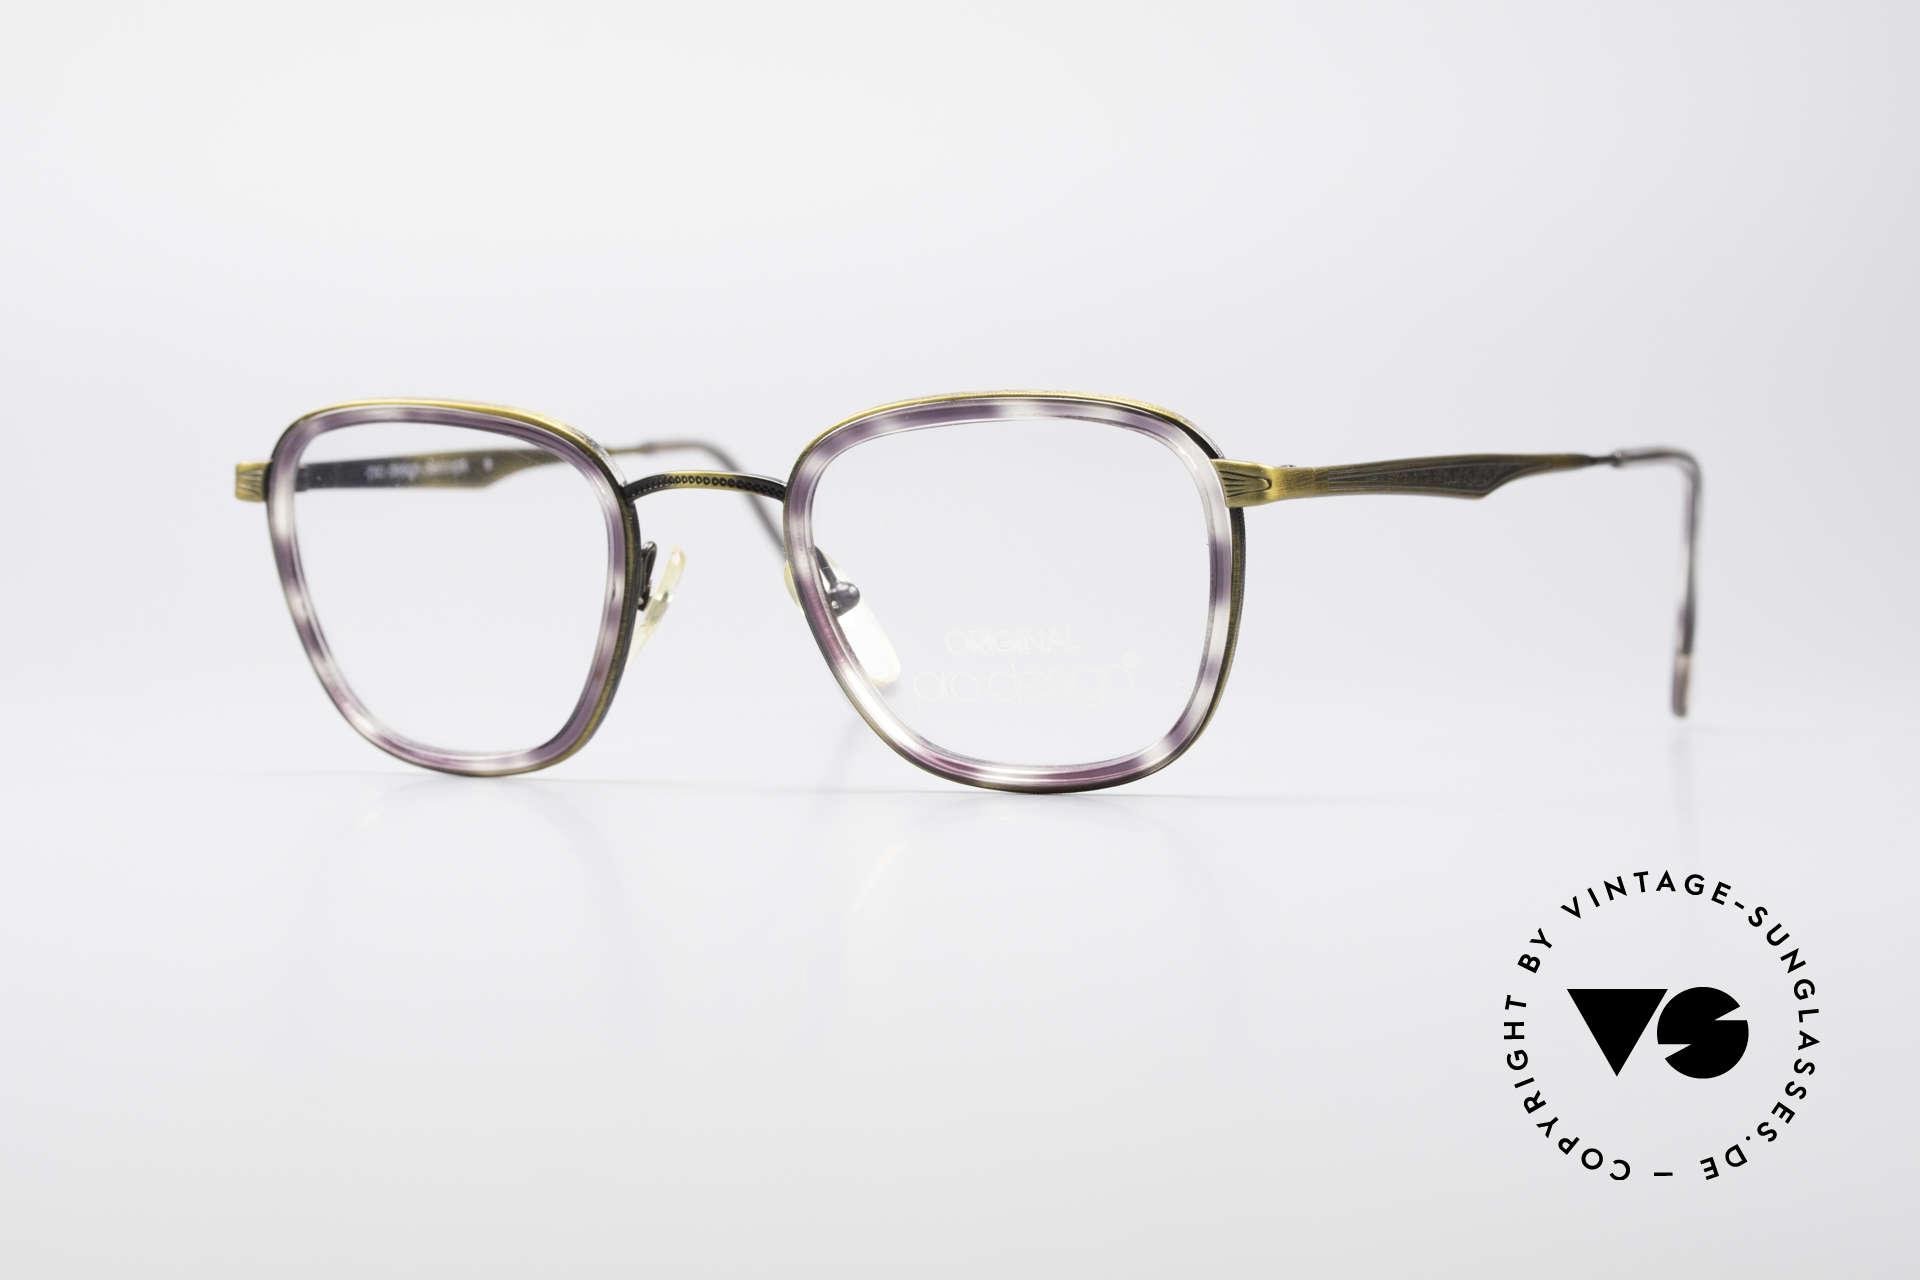 ProDesign Denmark Club 88A Vintage Glasses, Pro Design Optic Studio Denmark vintage glasses, Made for Men